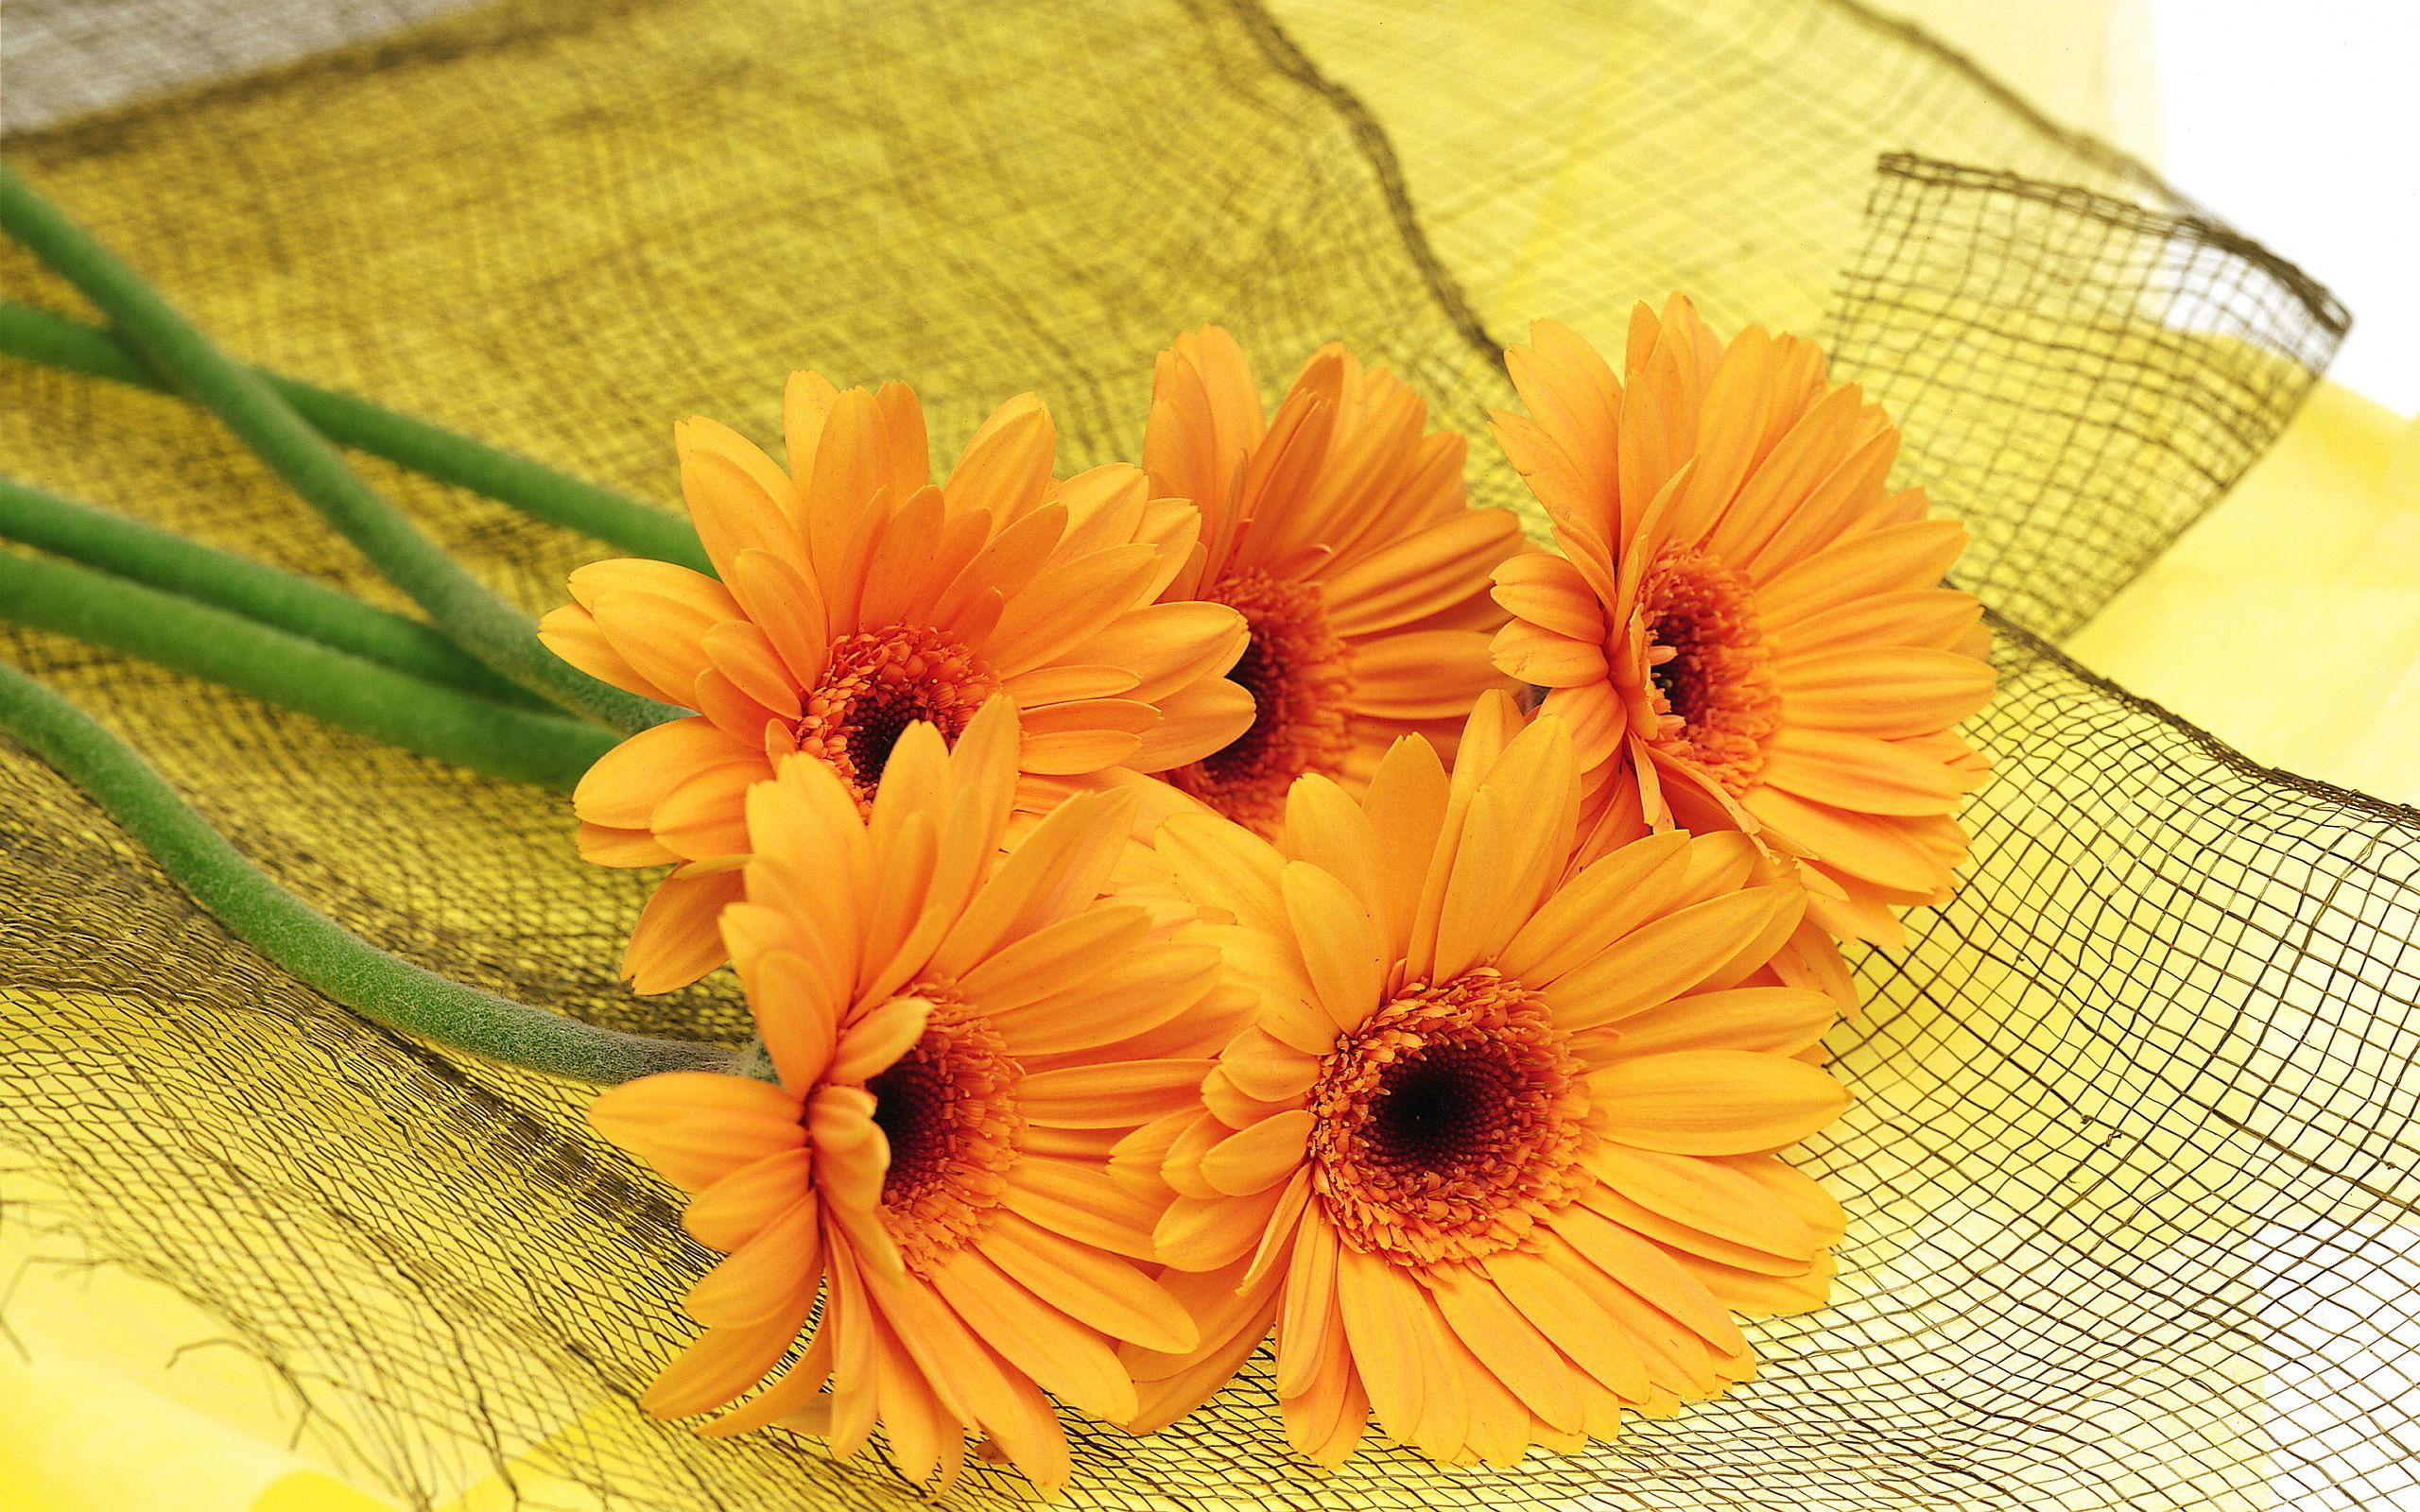 orange | Orange Flowers Wallpapers Pictures Photos Images ...